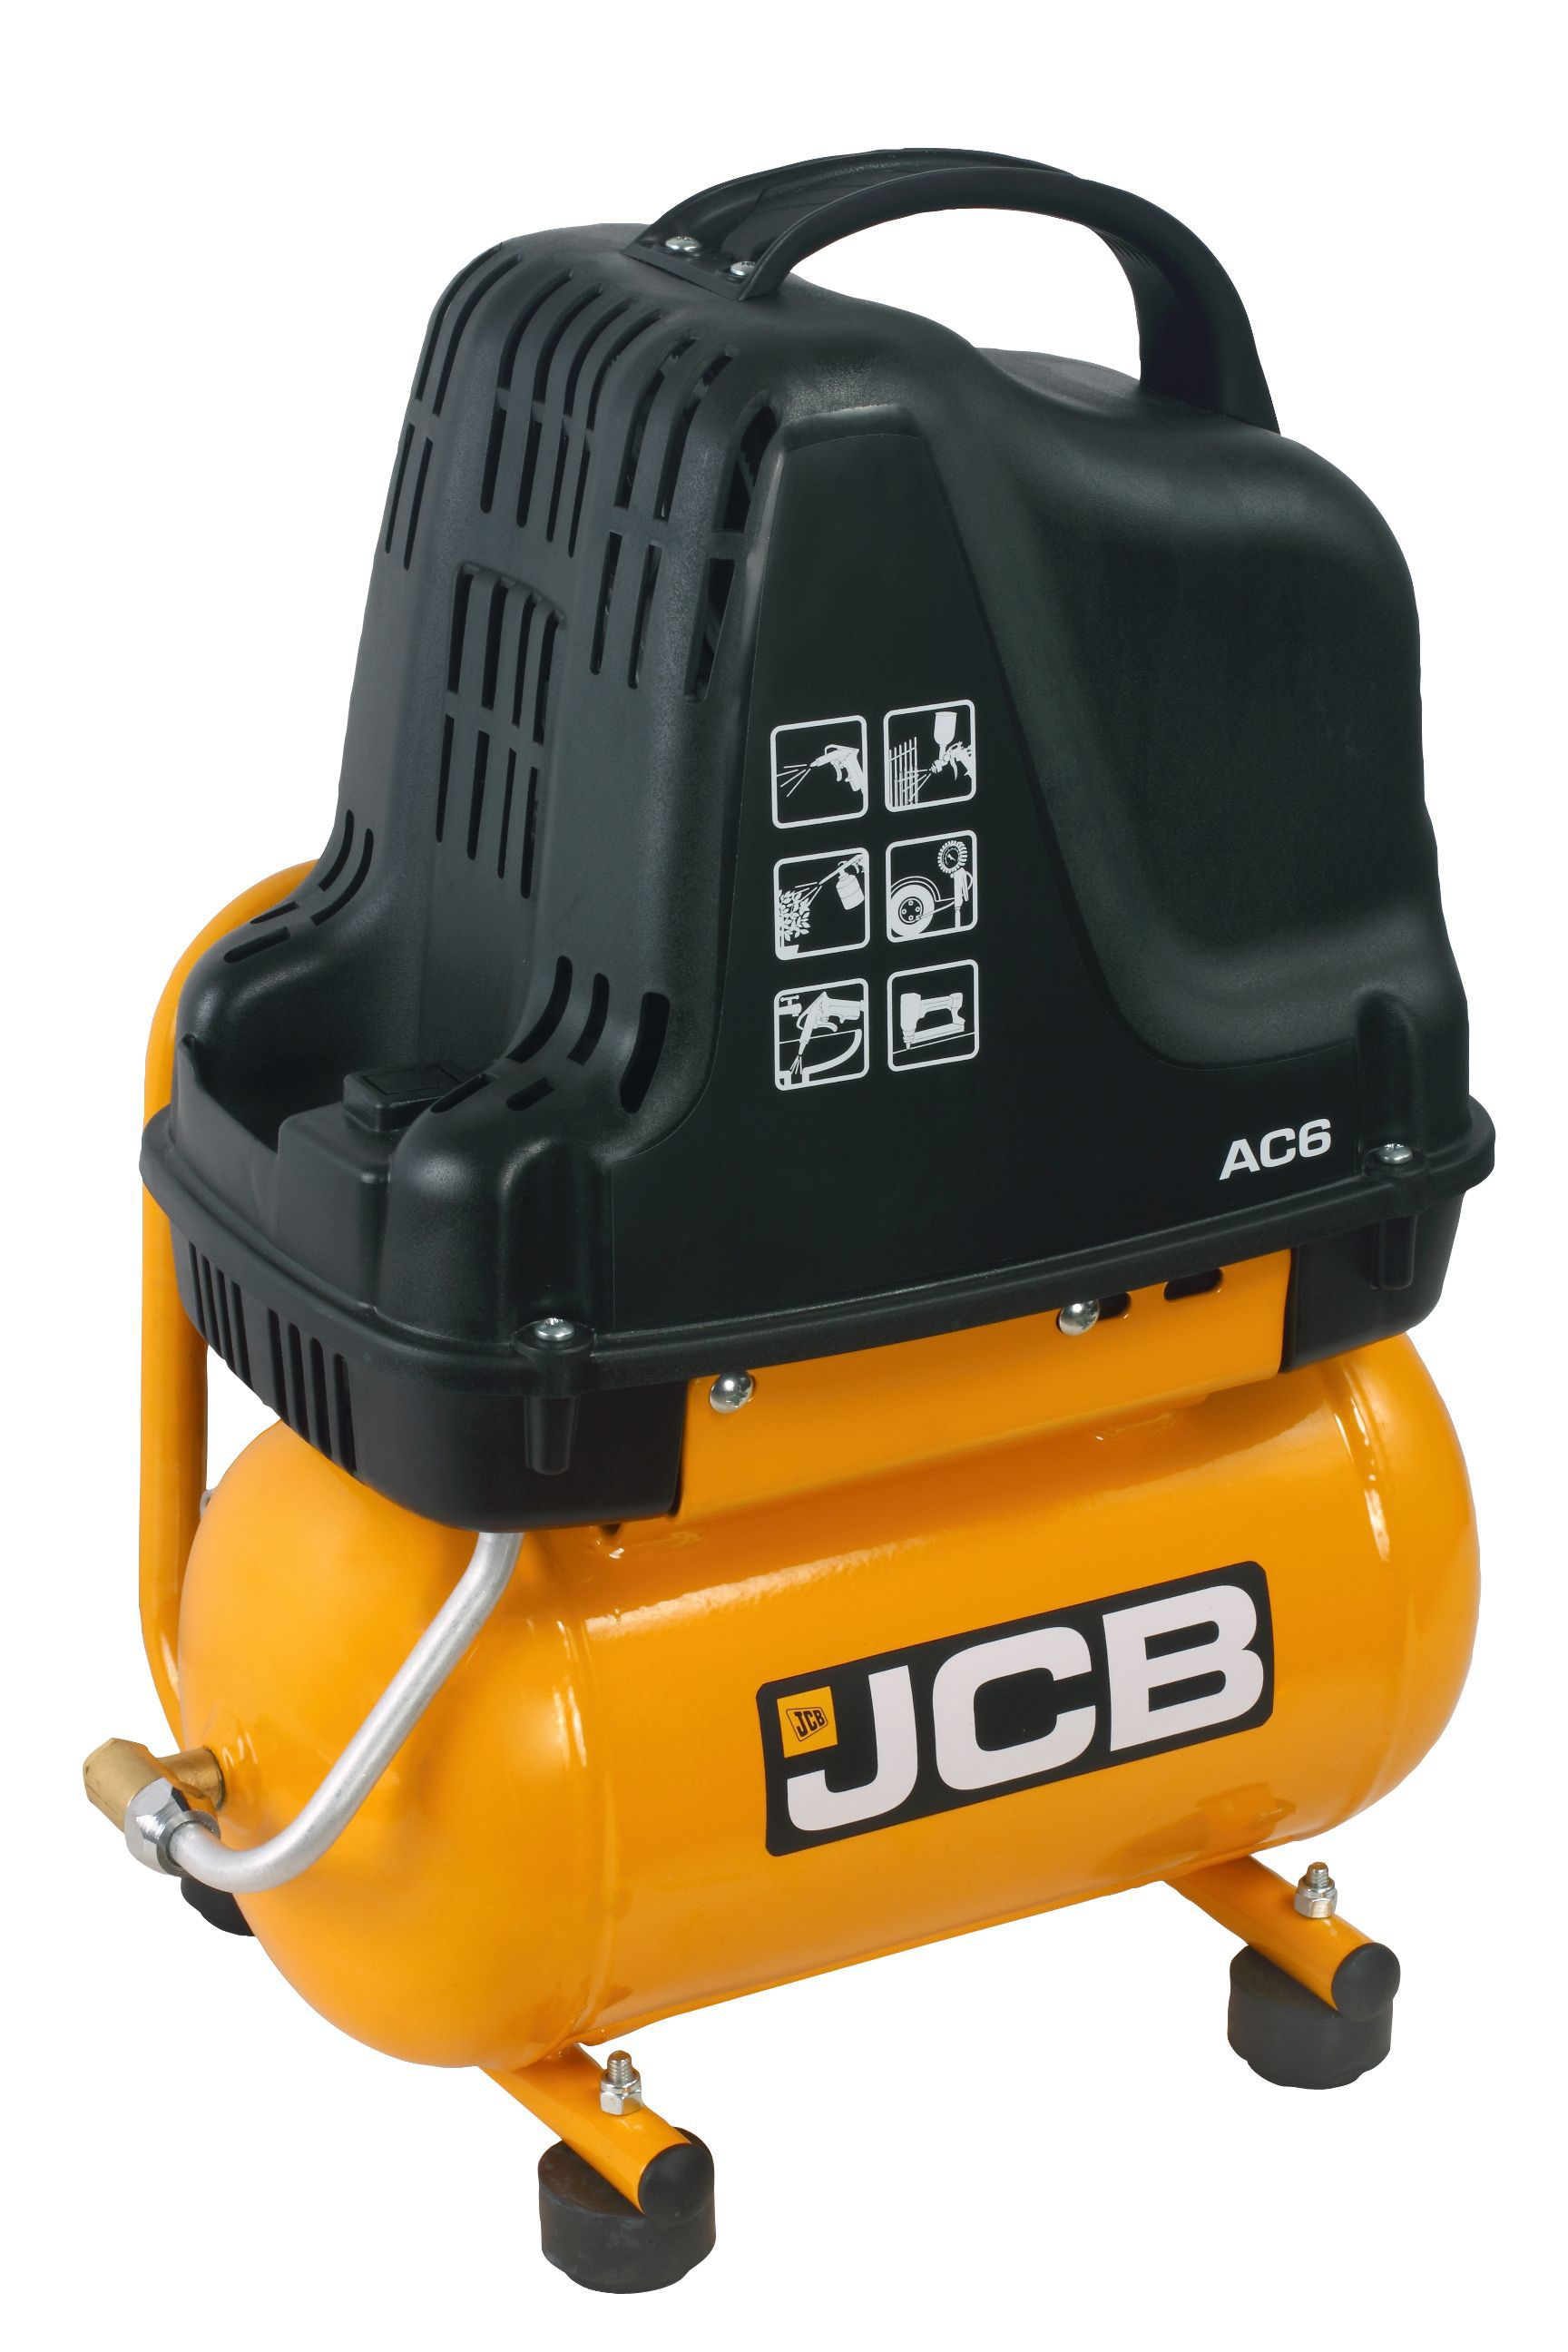 Jcb 6l Air Compressor Ac6 Departments Tradepoint